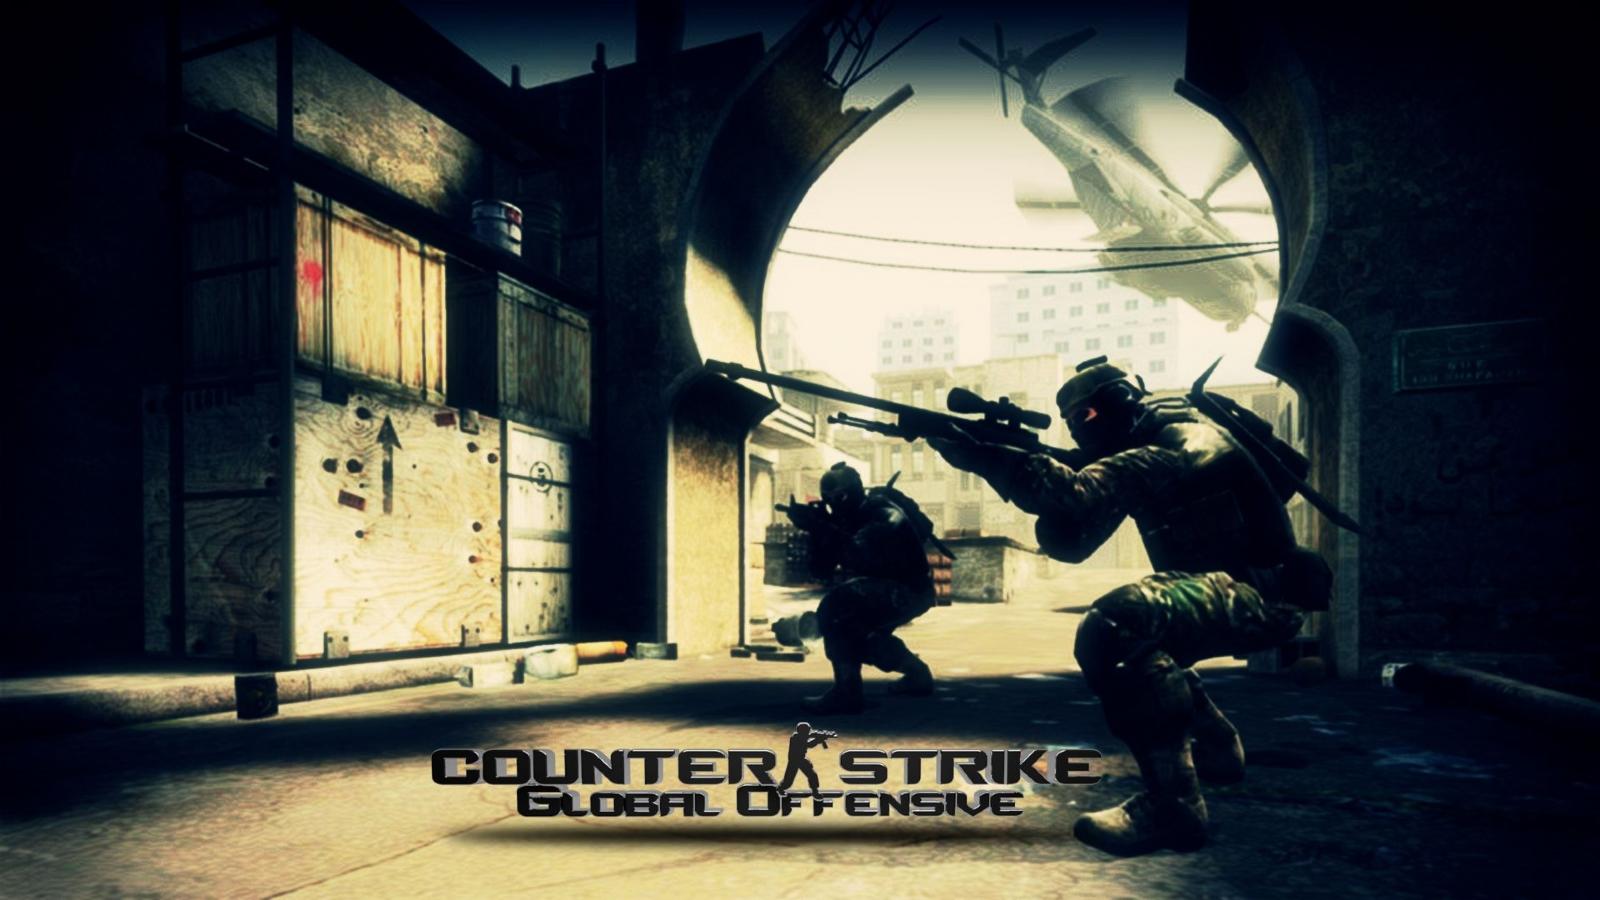 Counter Strike Global Offensive Wallpaper 1600x900 HD Wallpaper 1600x900